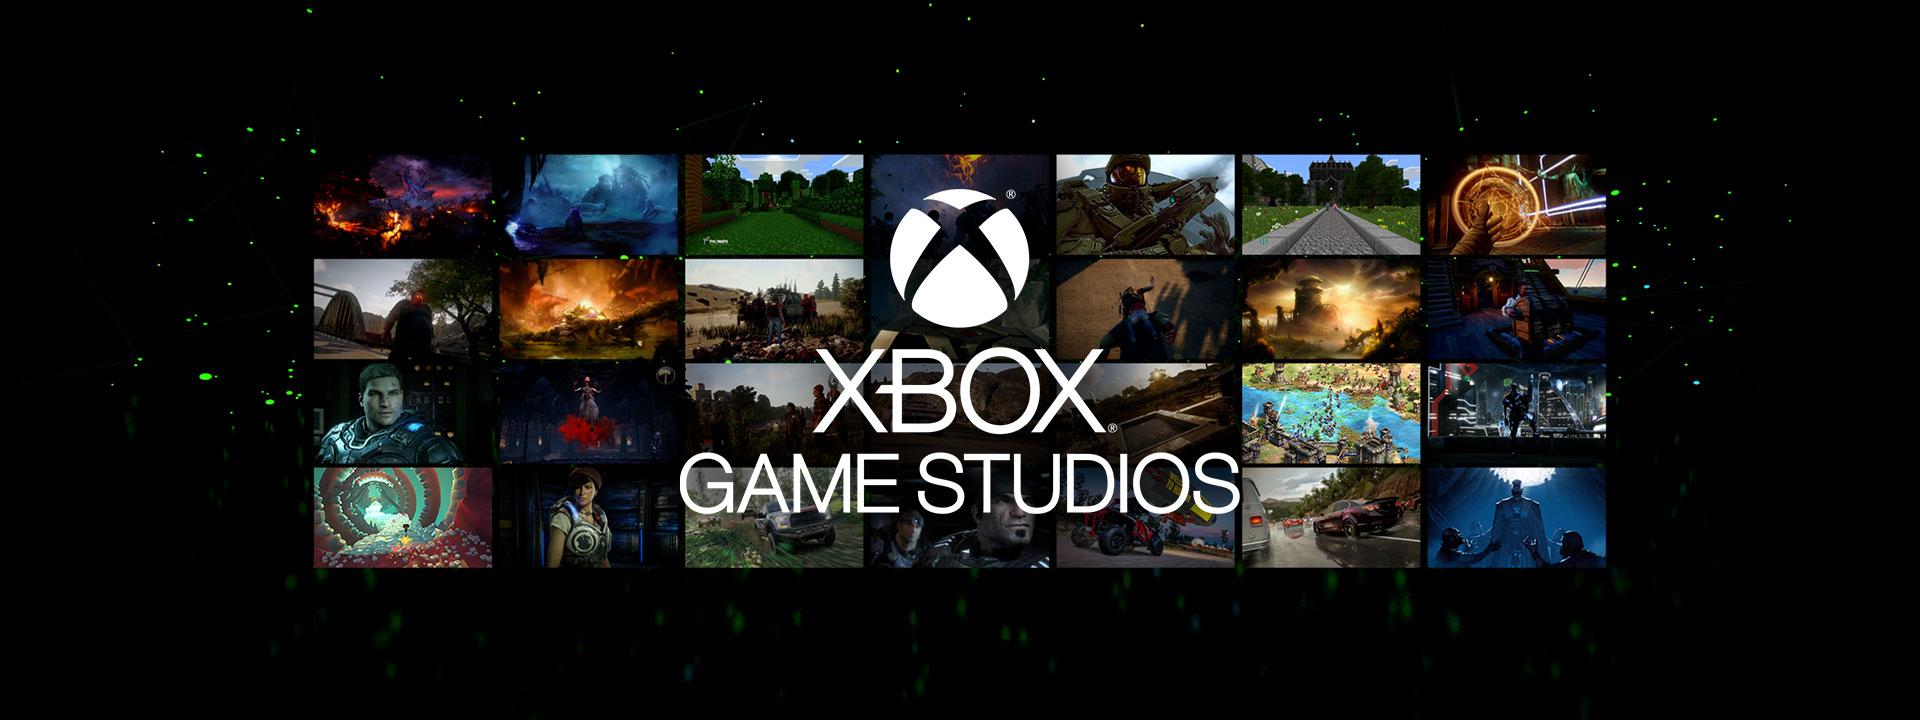 Logótipo do Xbox Games Studios sobre diversas capturas de ecrã de jogos